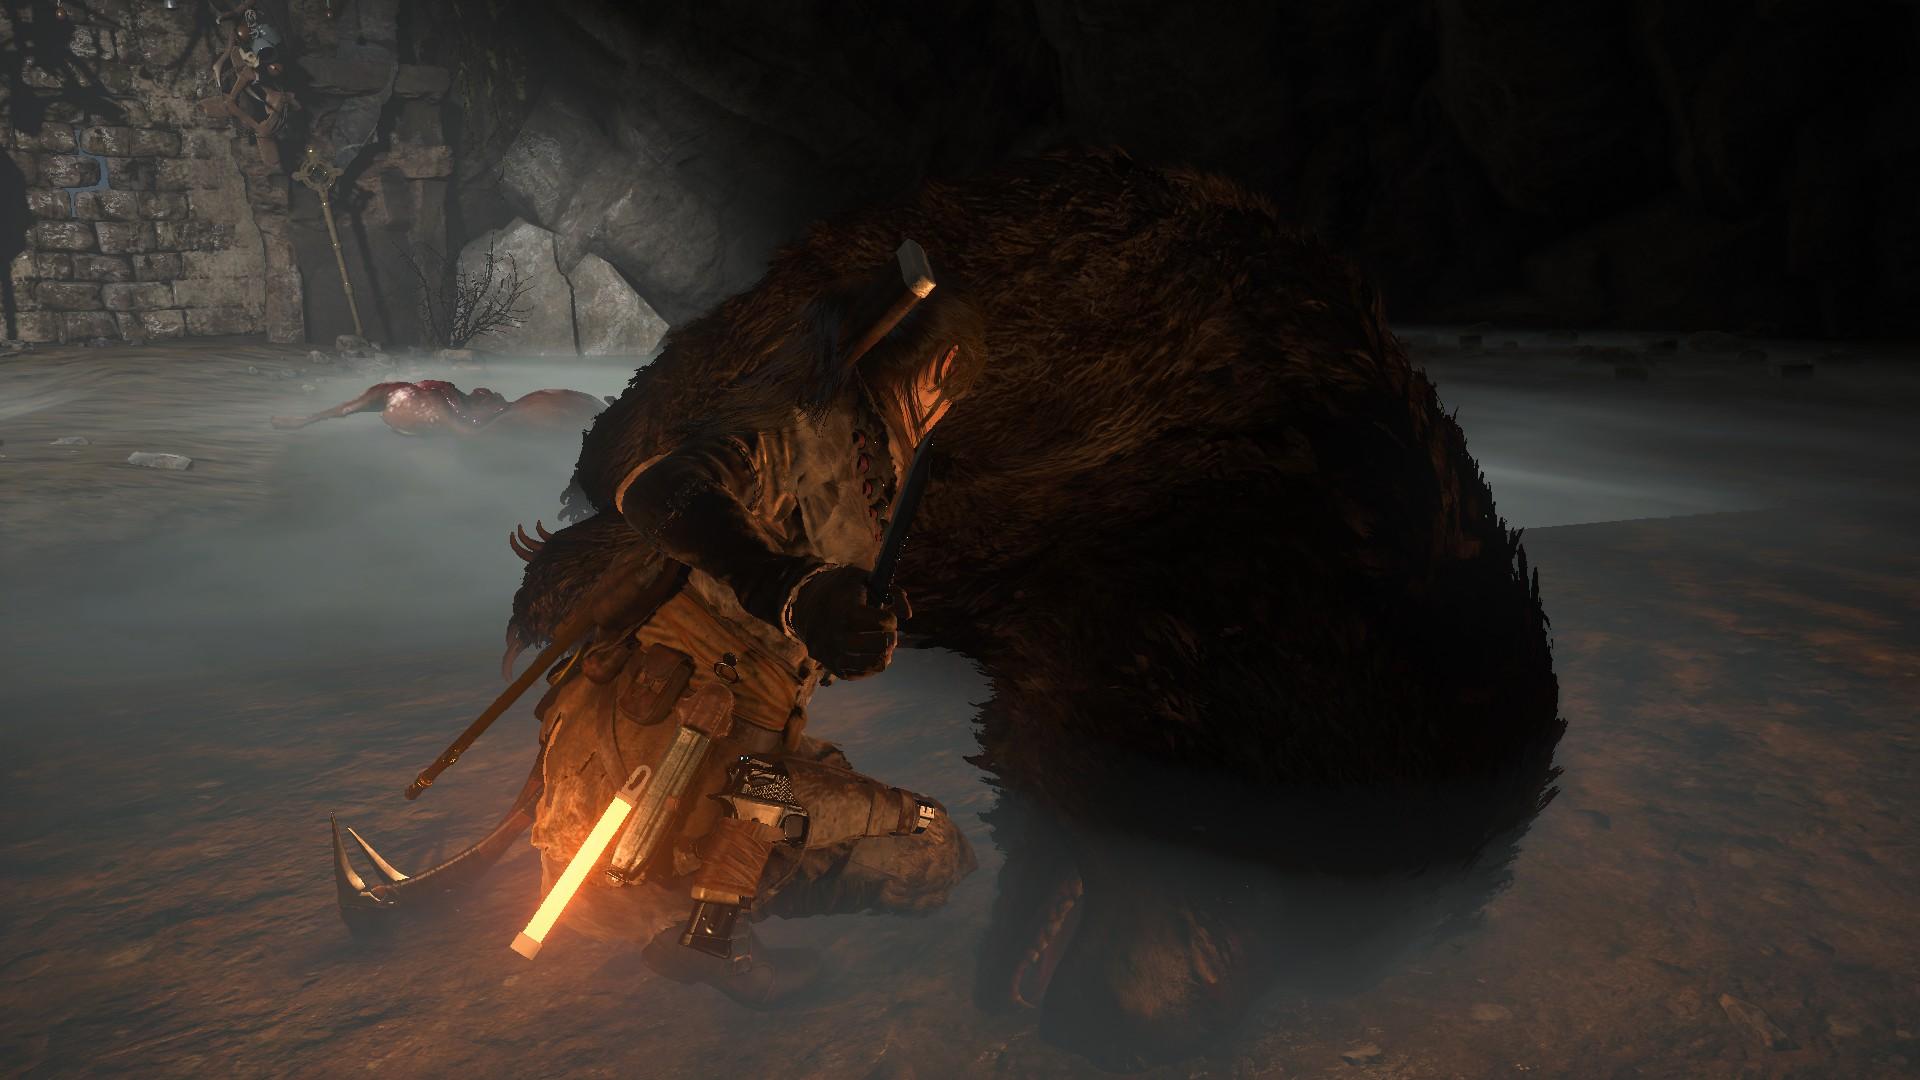 20171222135234_1.jpg - Rise of the Tomb Raider